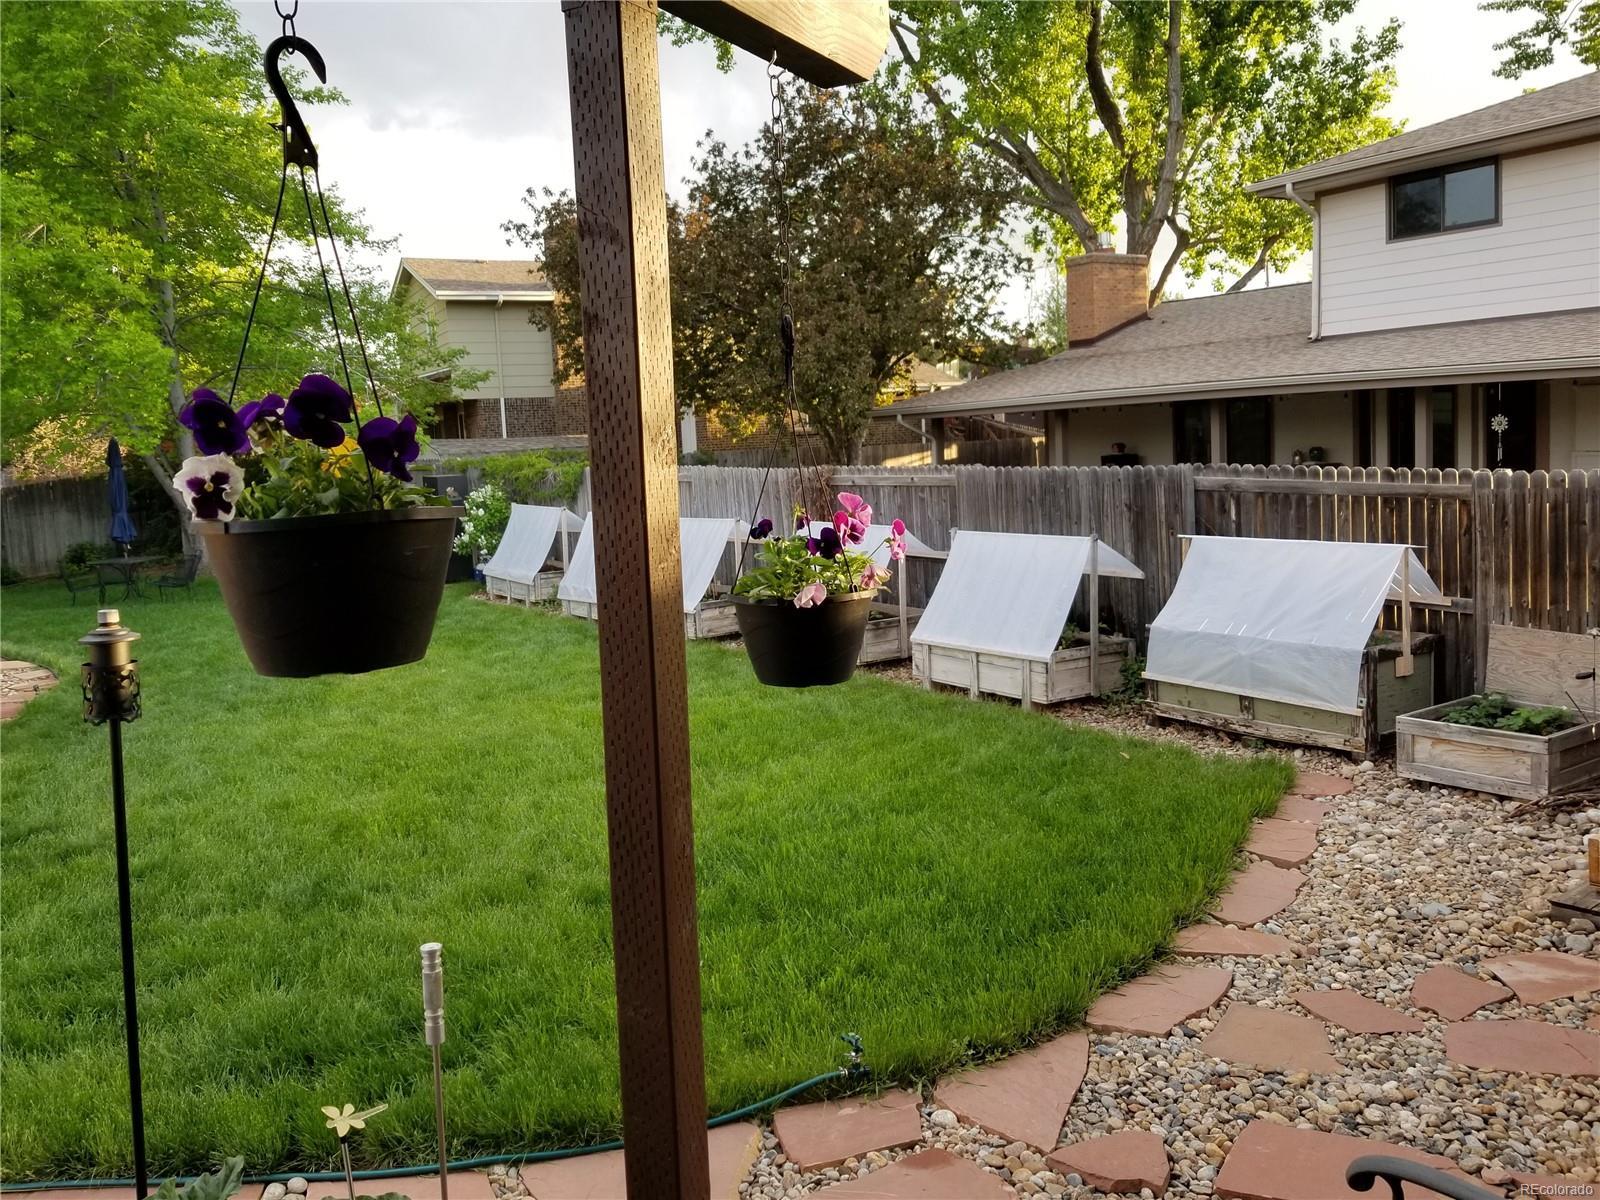 Movable Sprinkler System In Backyard Keeps Everything GREEN!